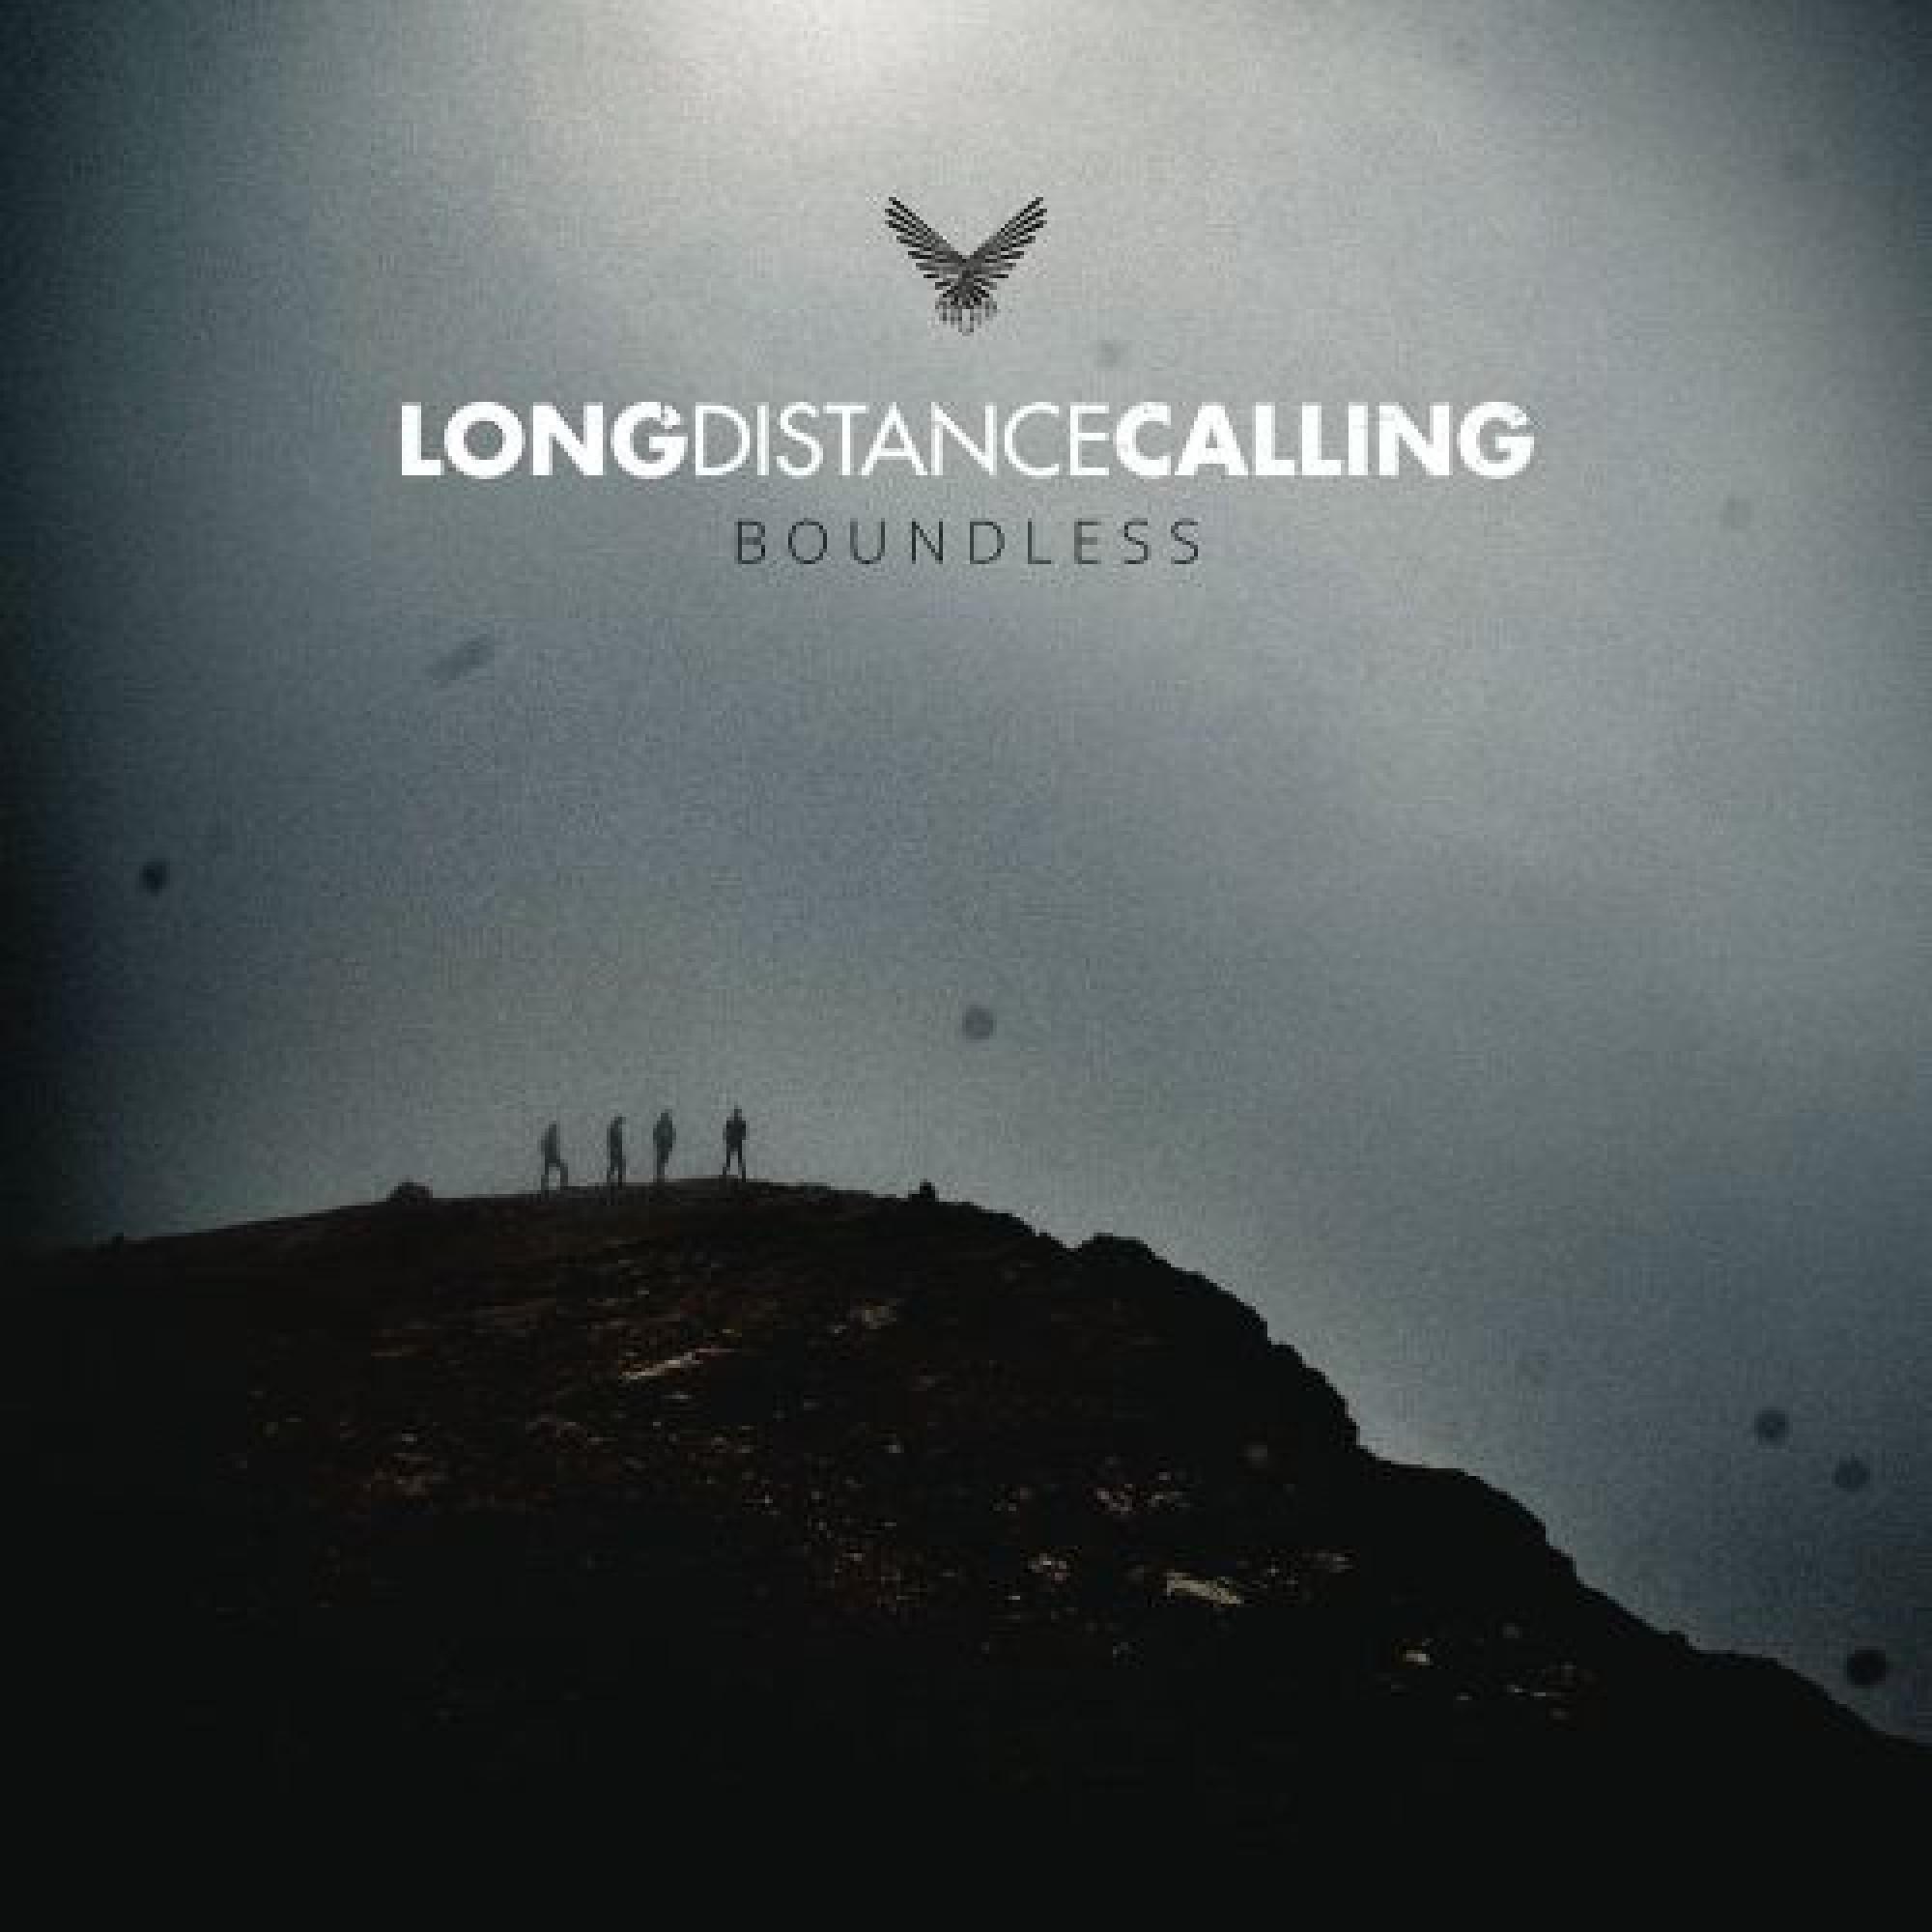 Long Distance Calling : Boundless